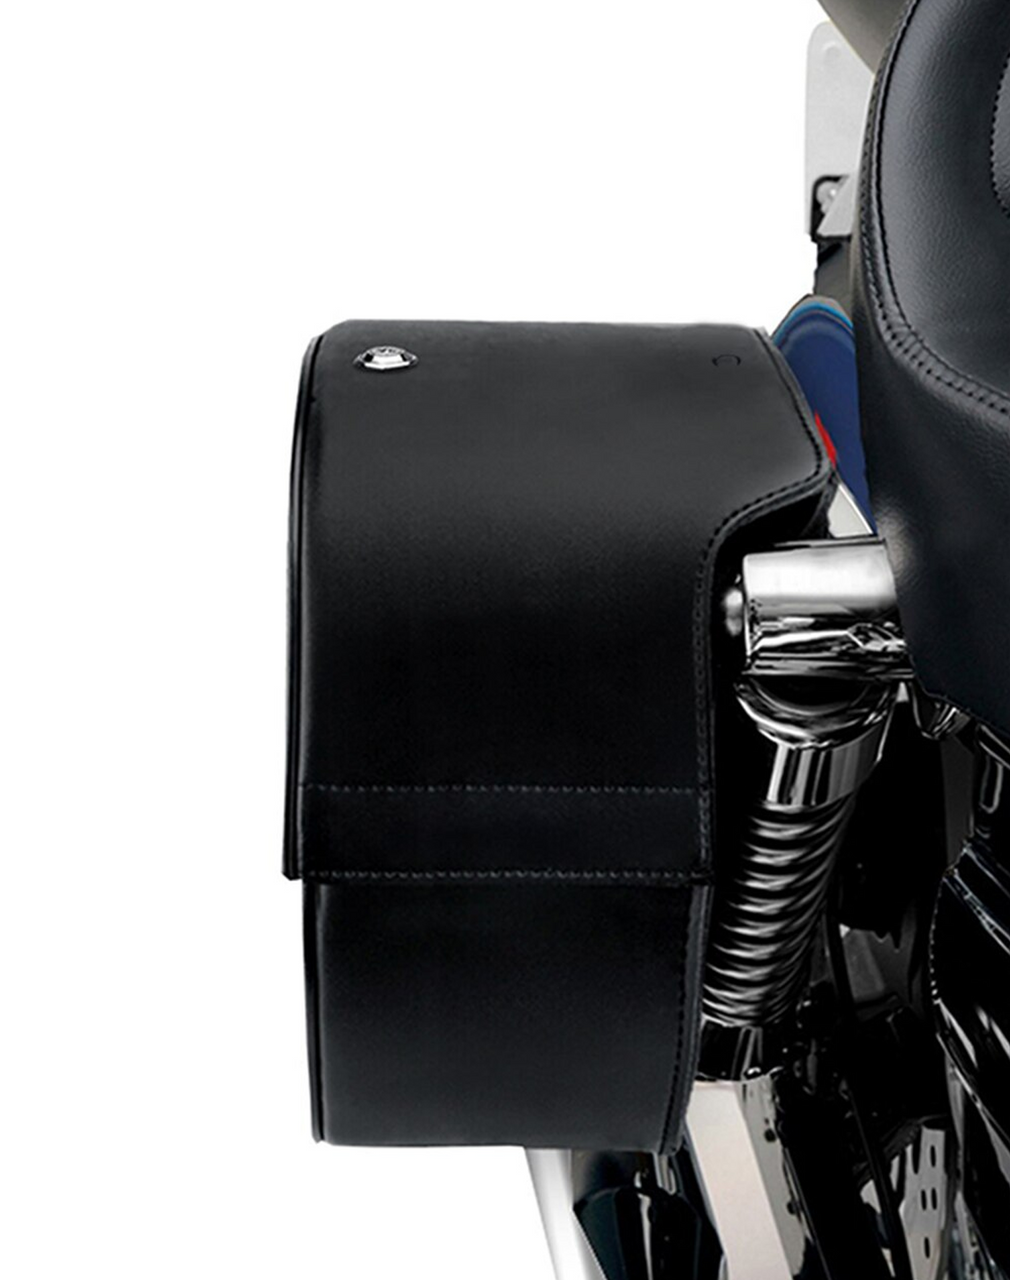 Kawasaki Eliminator 125 Shock Cutout Slanted Studded Large Motorcycle Saddlebags Shock Cutout View